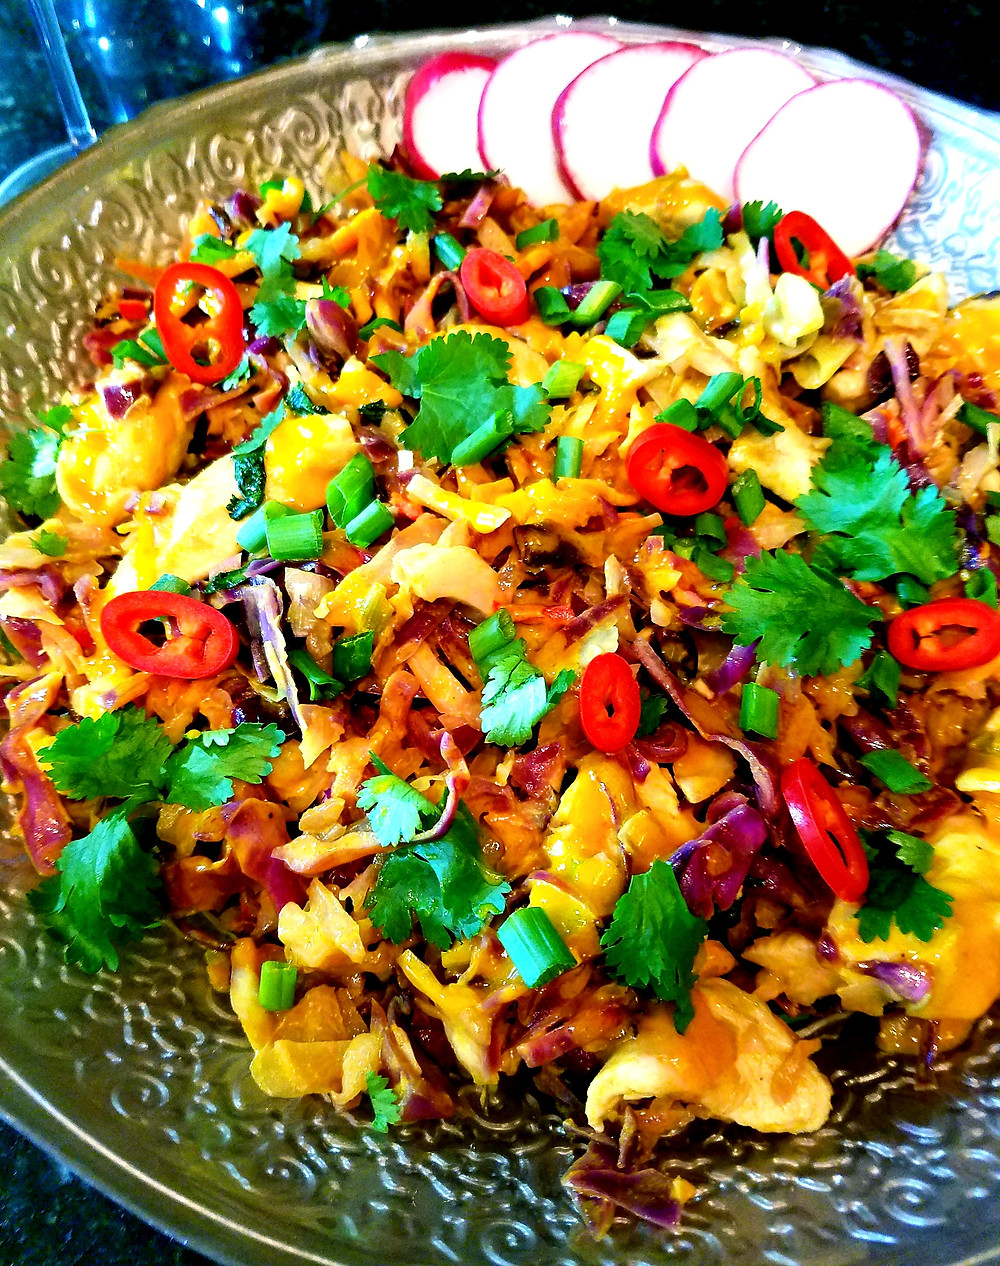 Warm Turmeric Tahini Chicken Salad (Gluten-free, no soy/grains/dairy)